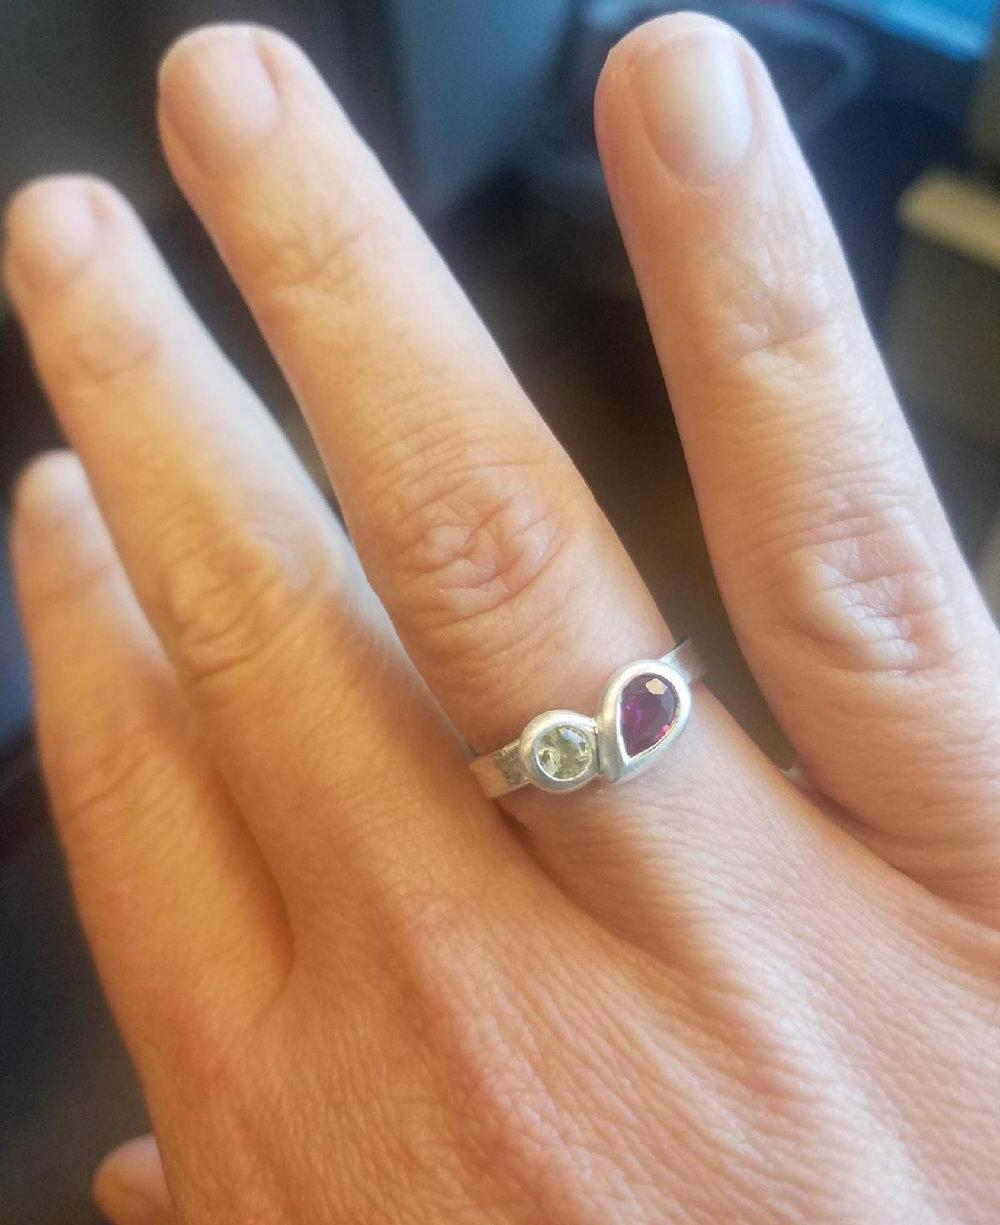 birthstone ring worn.jpg